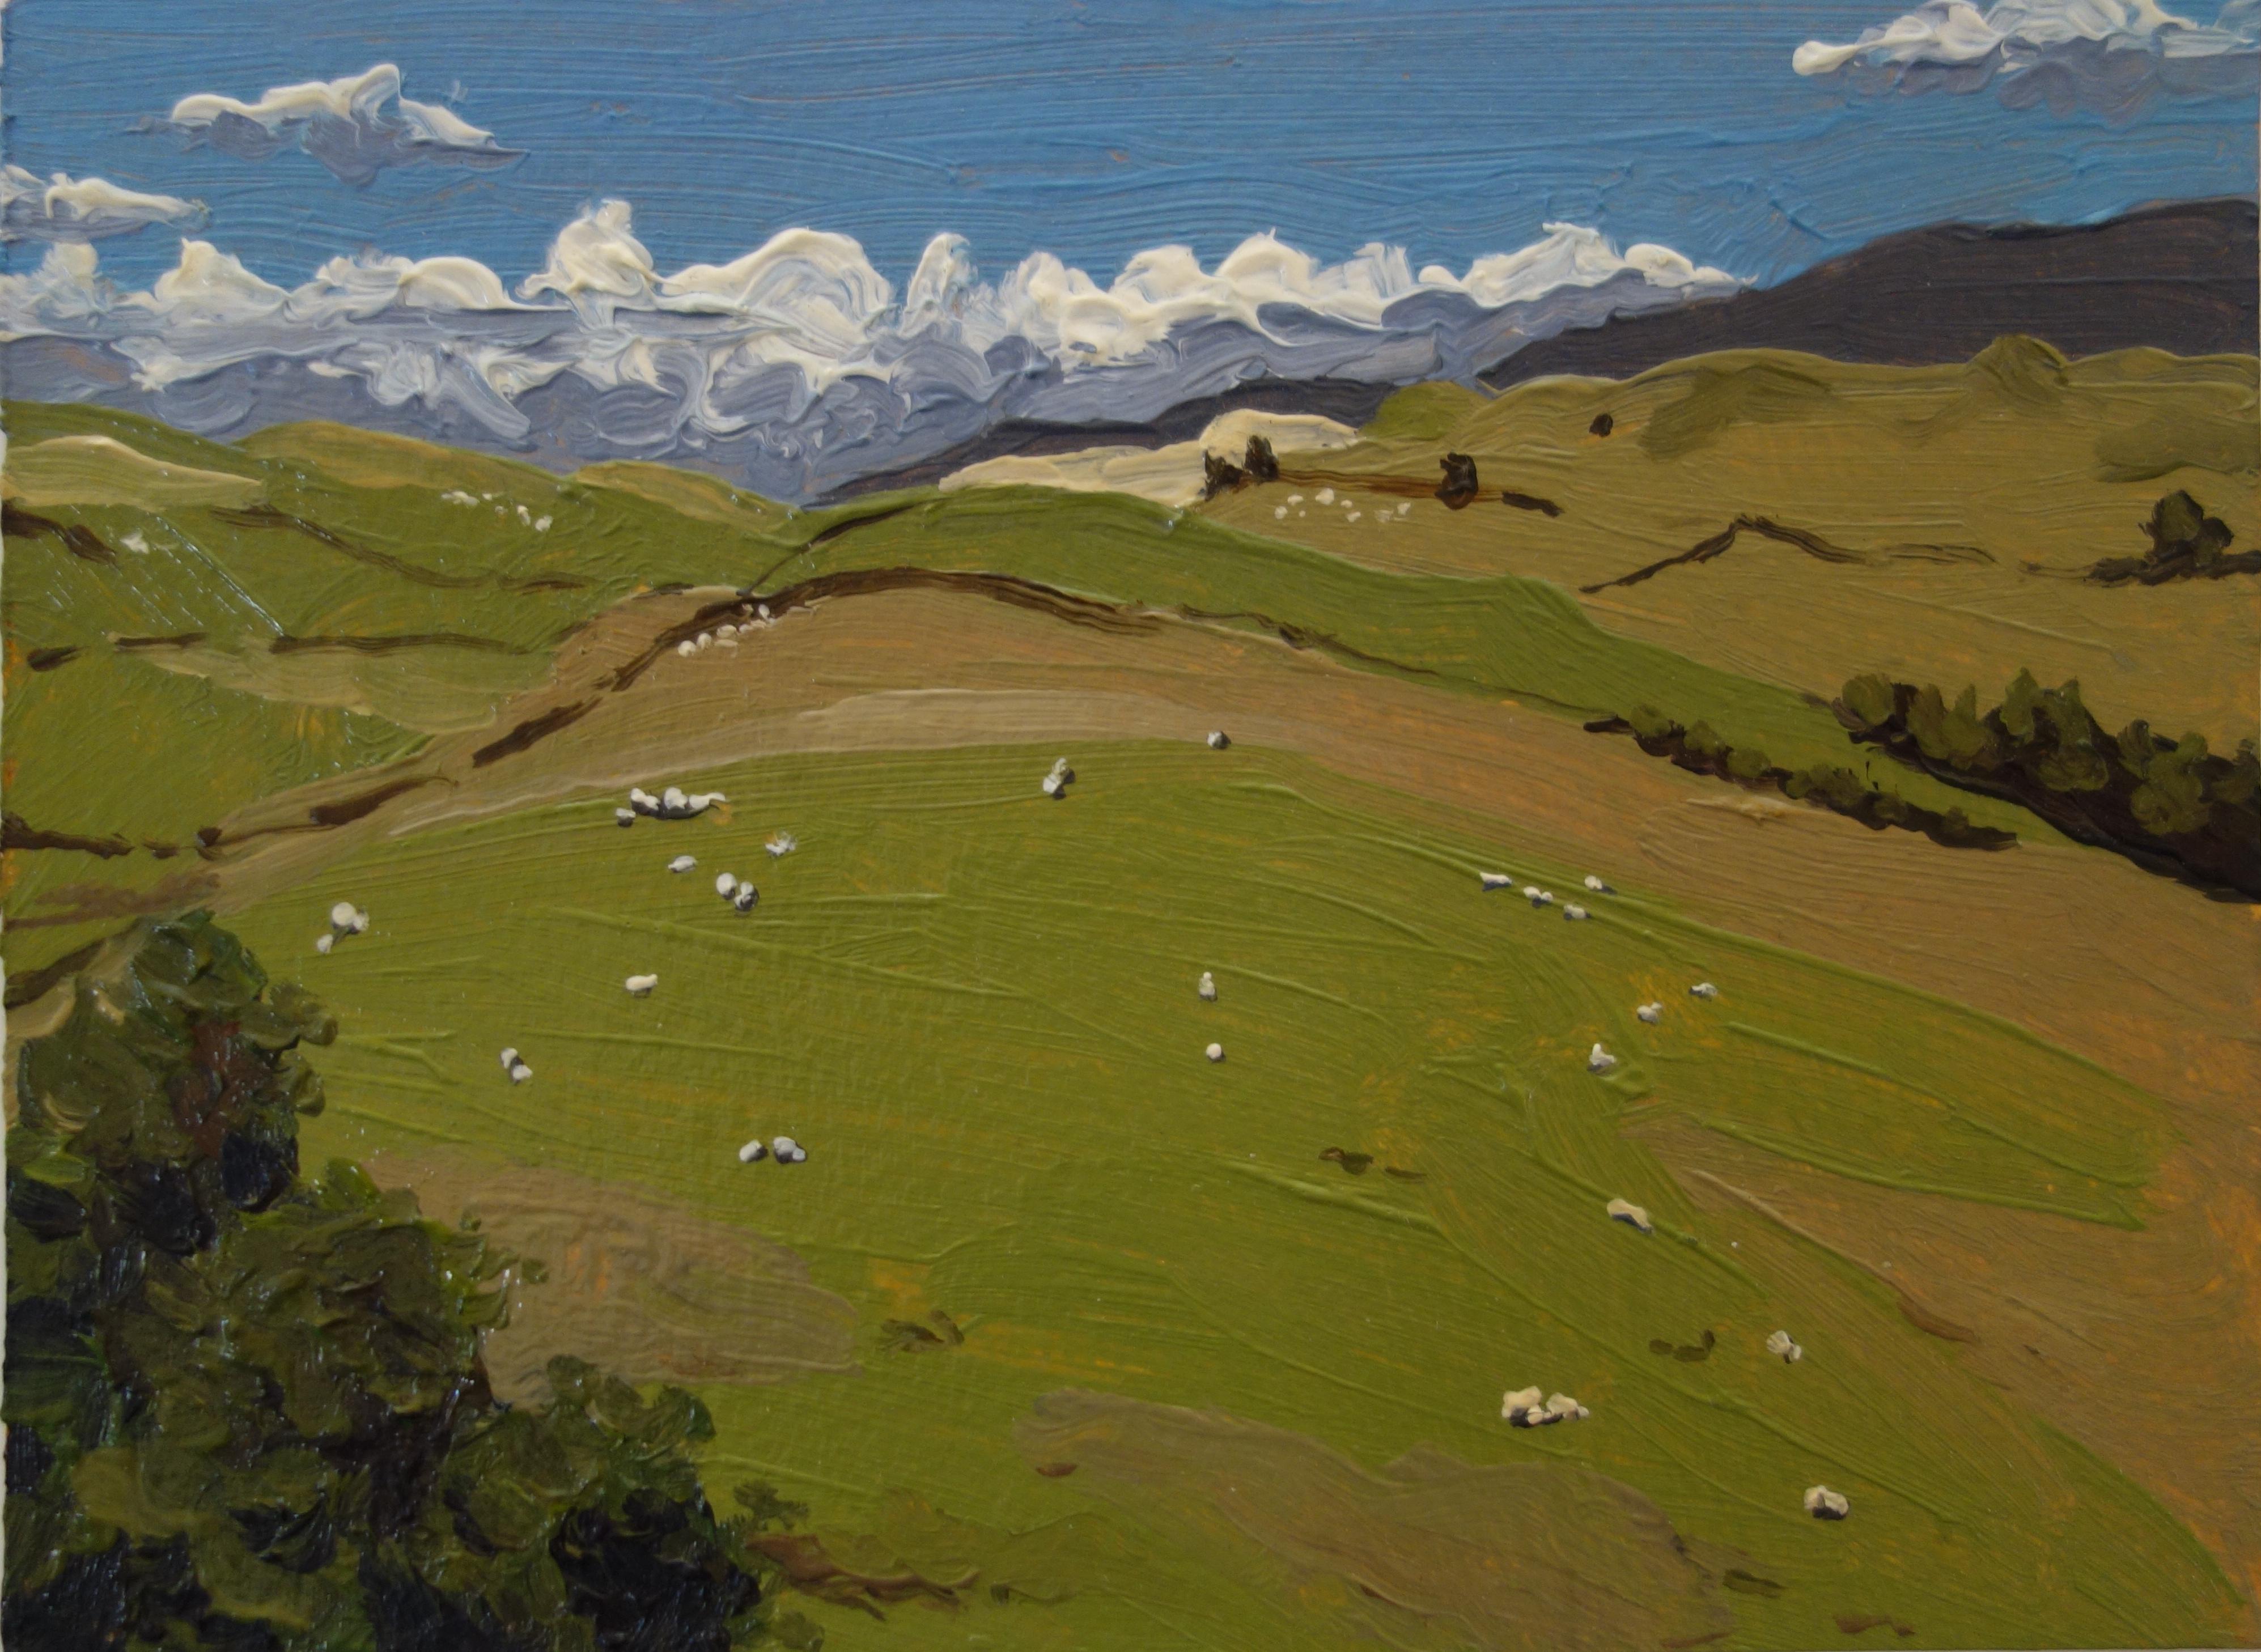 Lake District Pasture